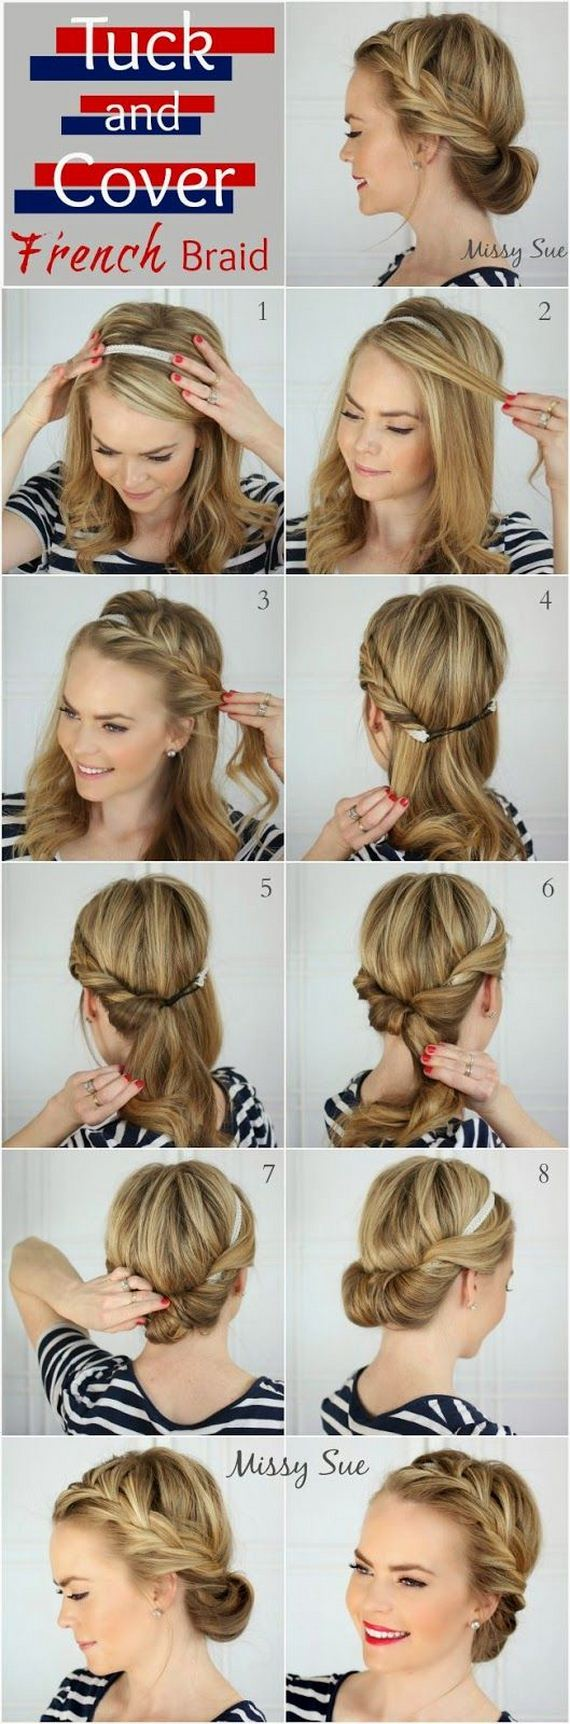 12-style-bangs